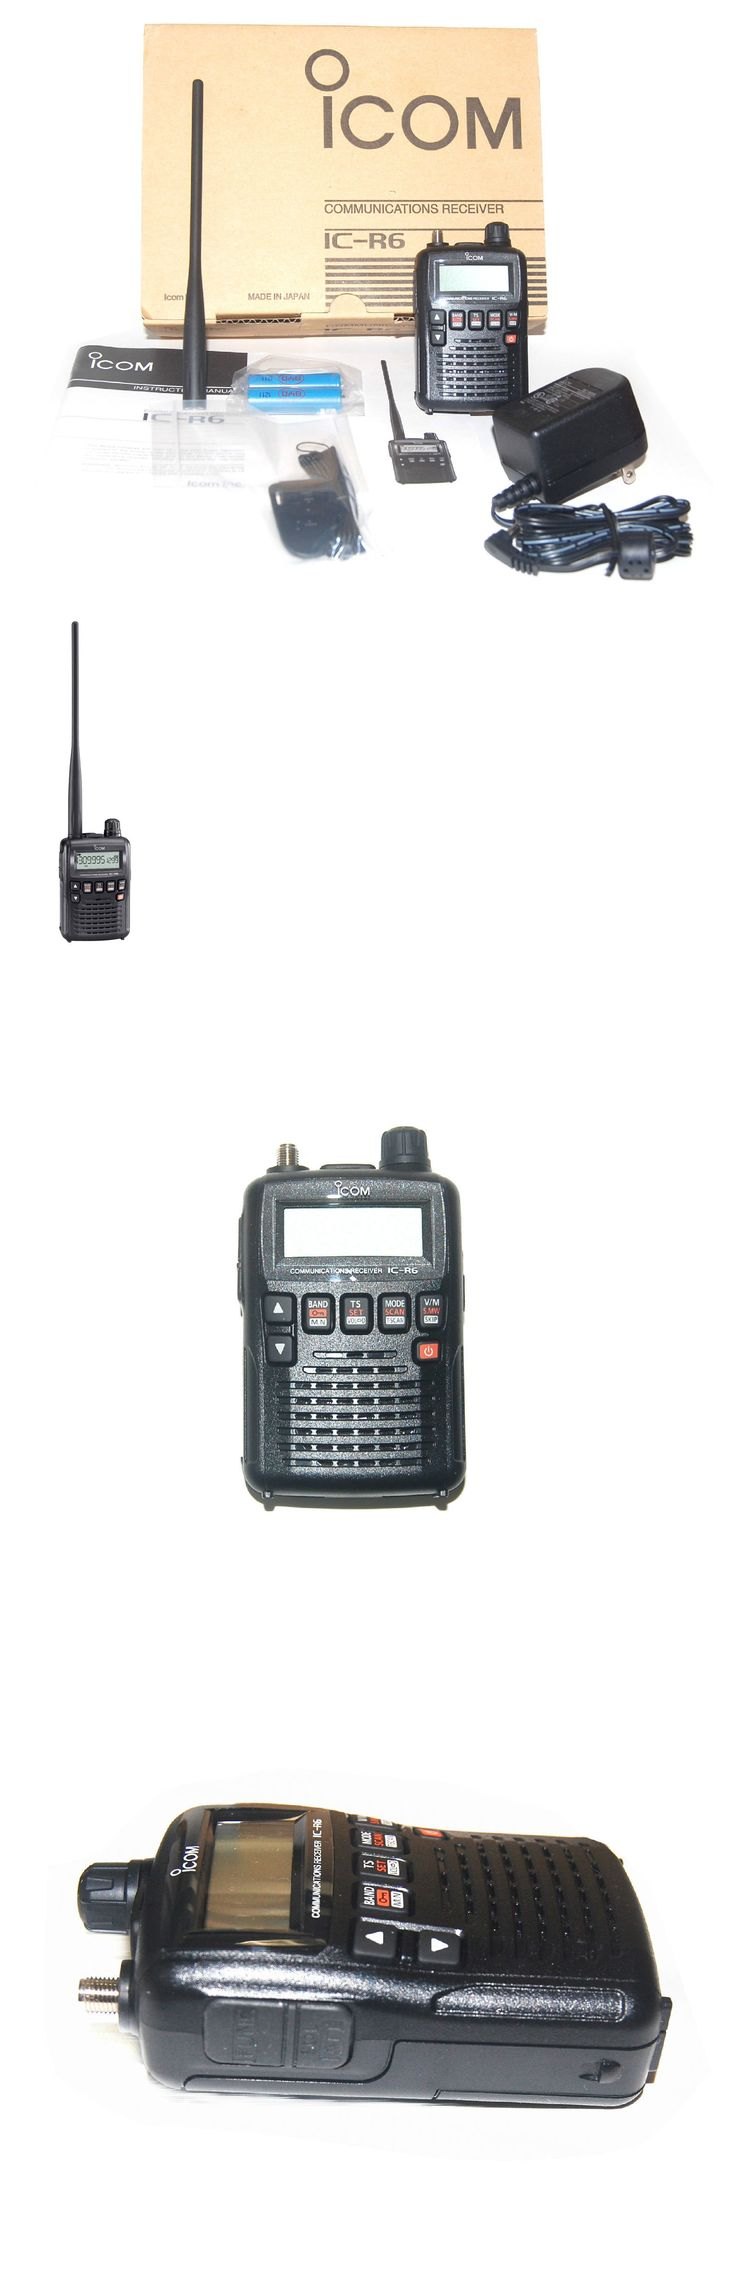 Ham Radio Receivers: New Icom Ic-R6-20 Ipx2 Mil-Std-810 Exp Wide Band Handheld Scanner Receiver Radio -> BUY IT NOW ONLY: $236.95 on eBay!